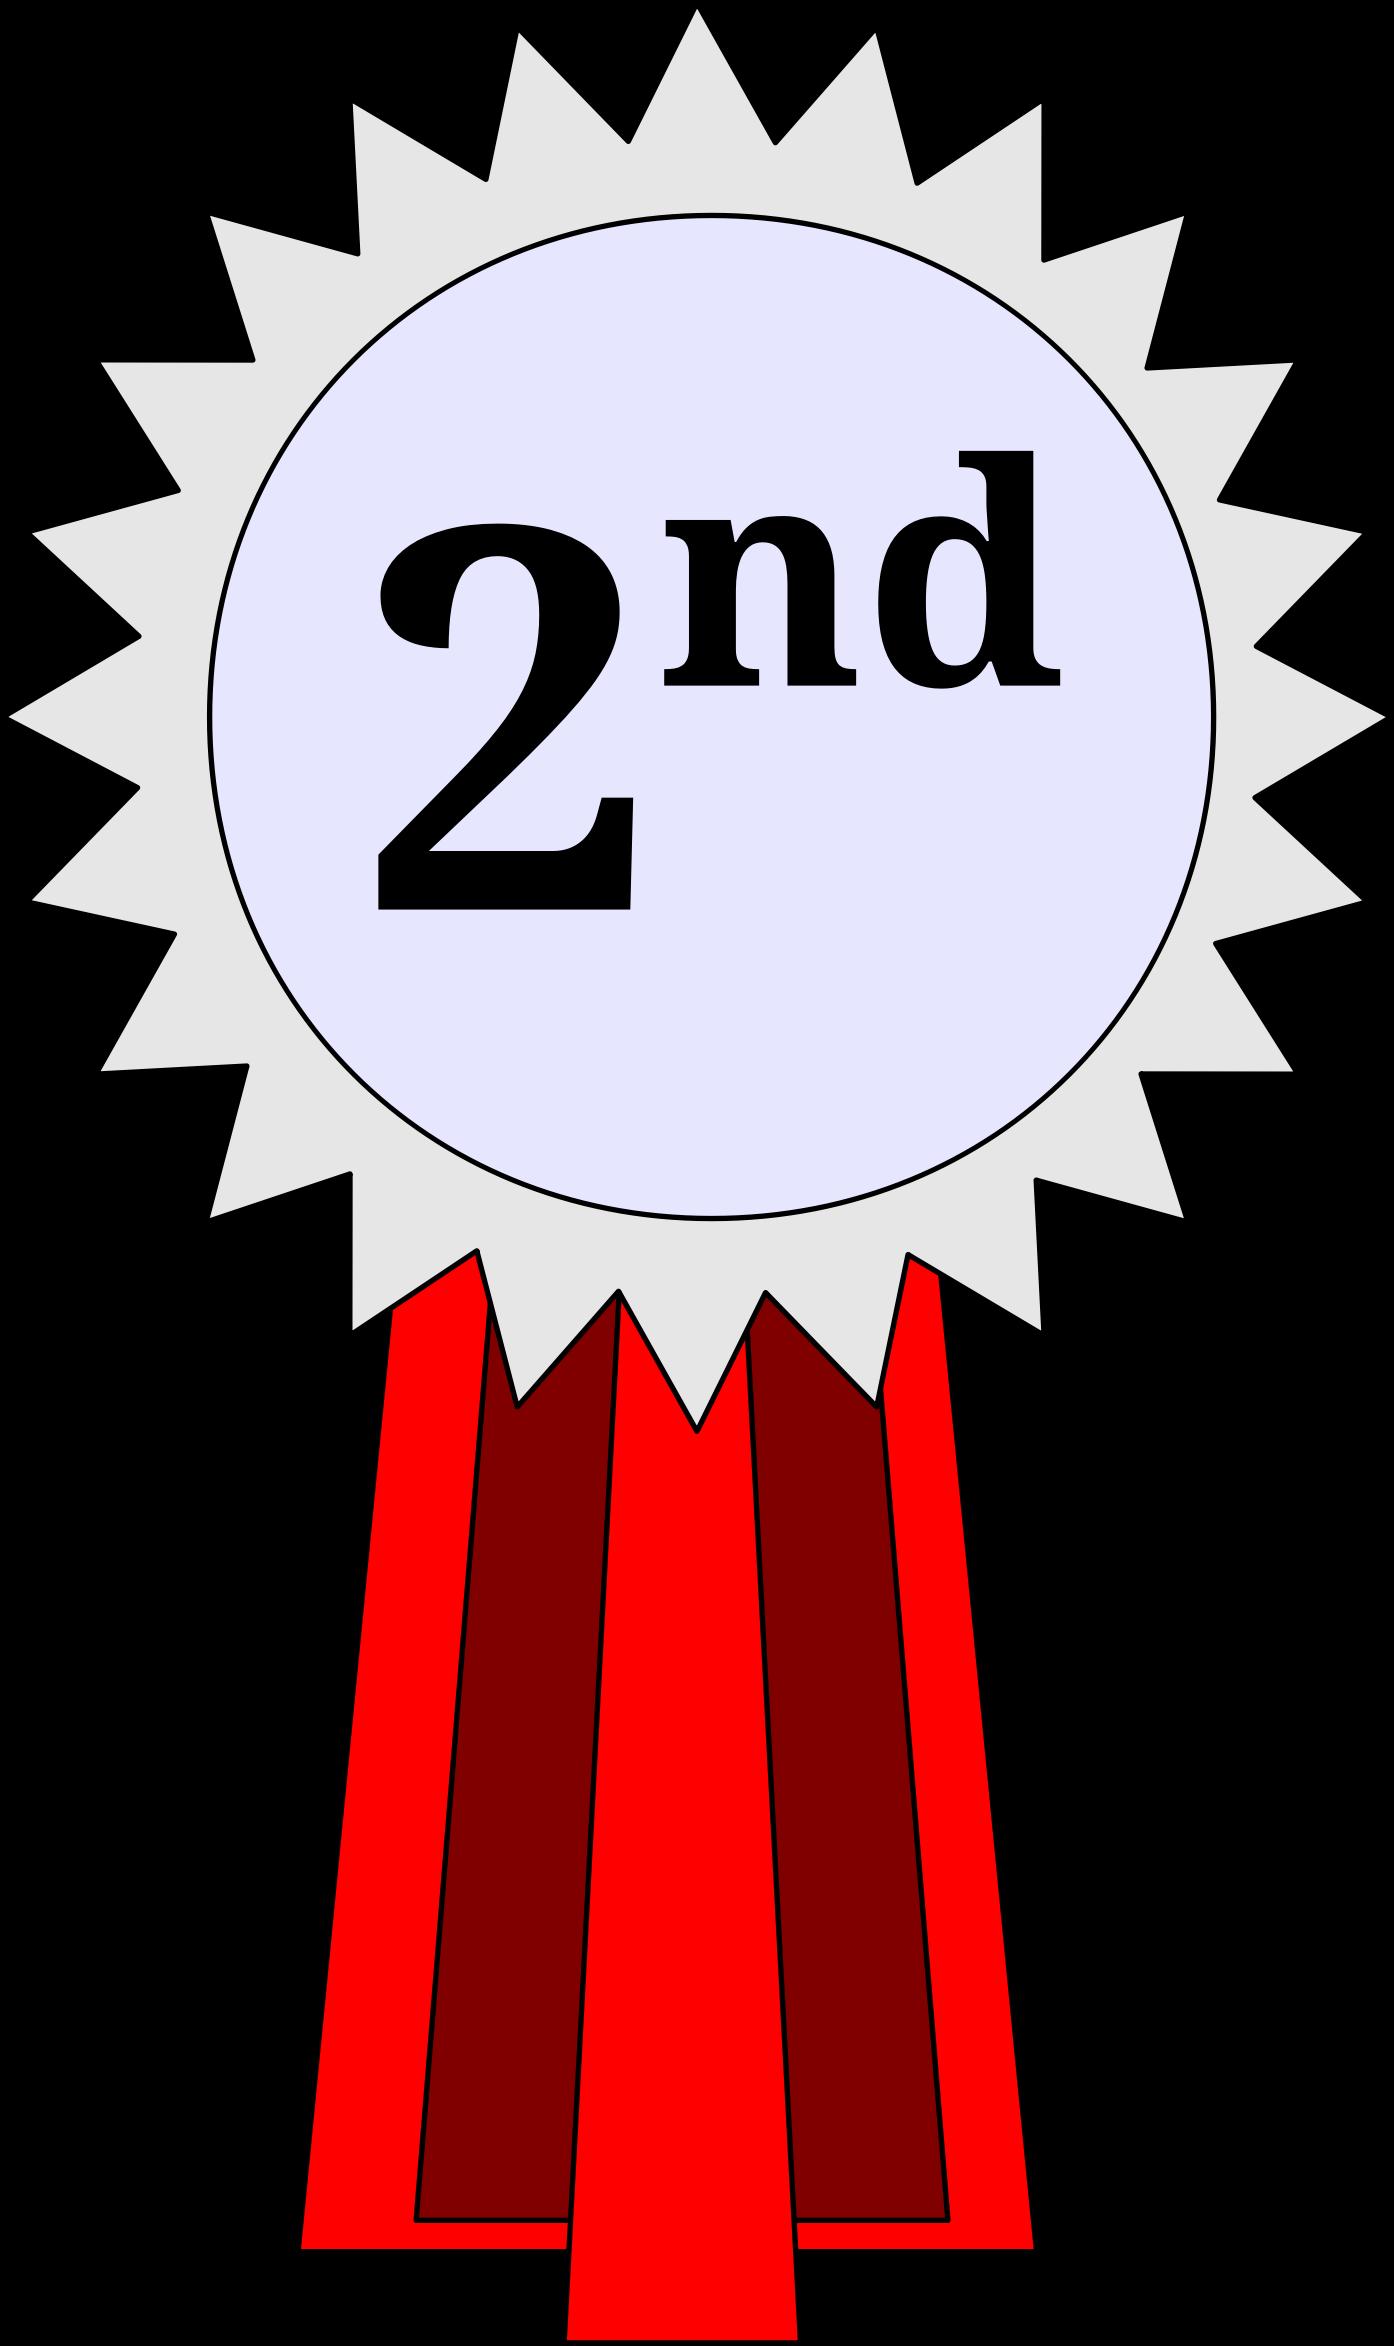 Prize clipart, Prize Transparent FREE for download on WebStockReview 2020